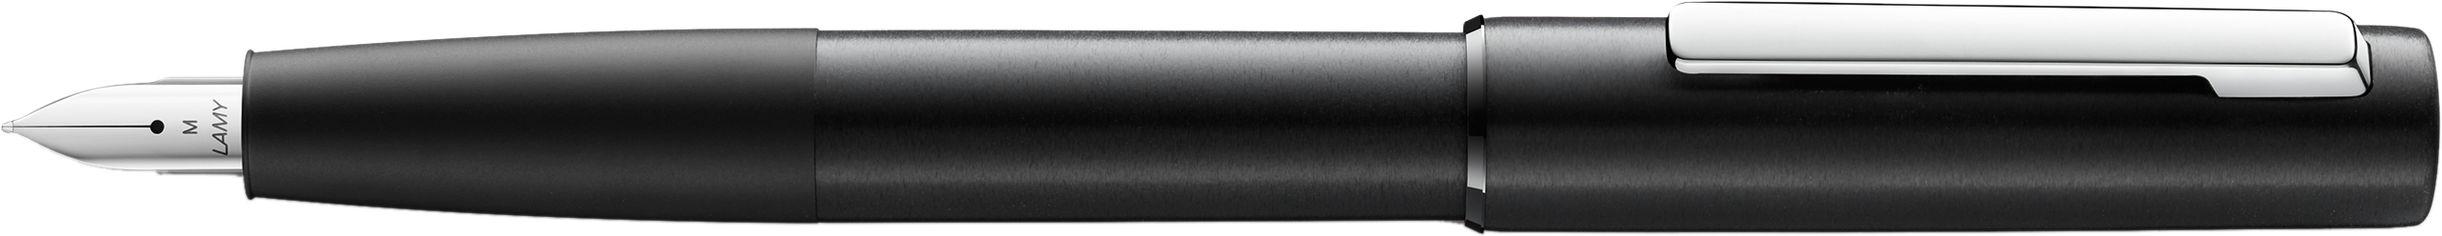 Акция на Ручка чернильная Lamy Aion Чёрная EF / Чернила T10 Синие (4014519689119) от Rozetka